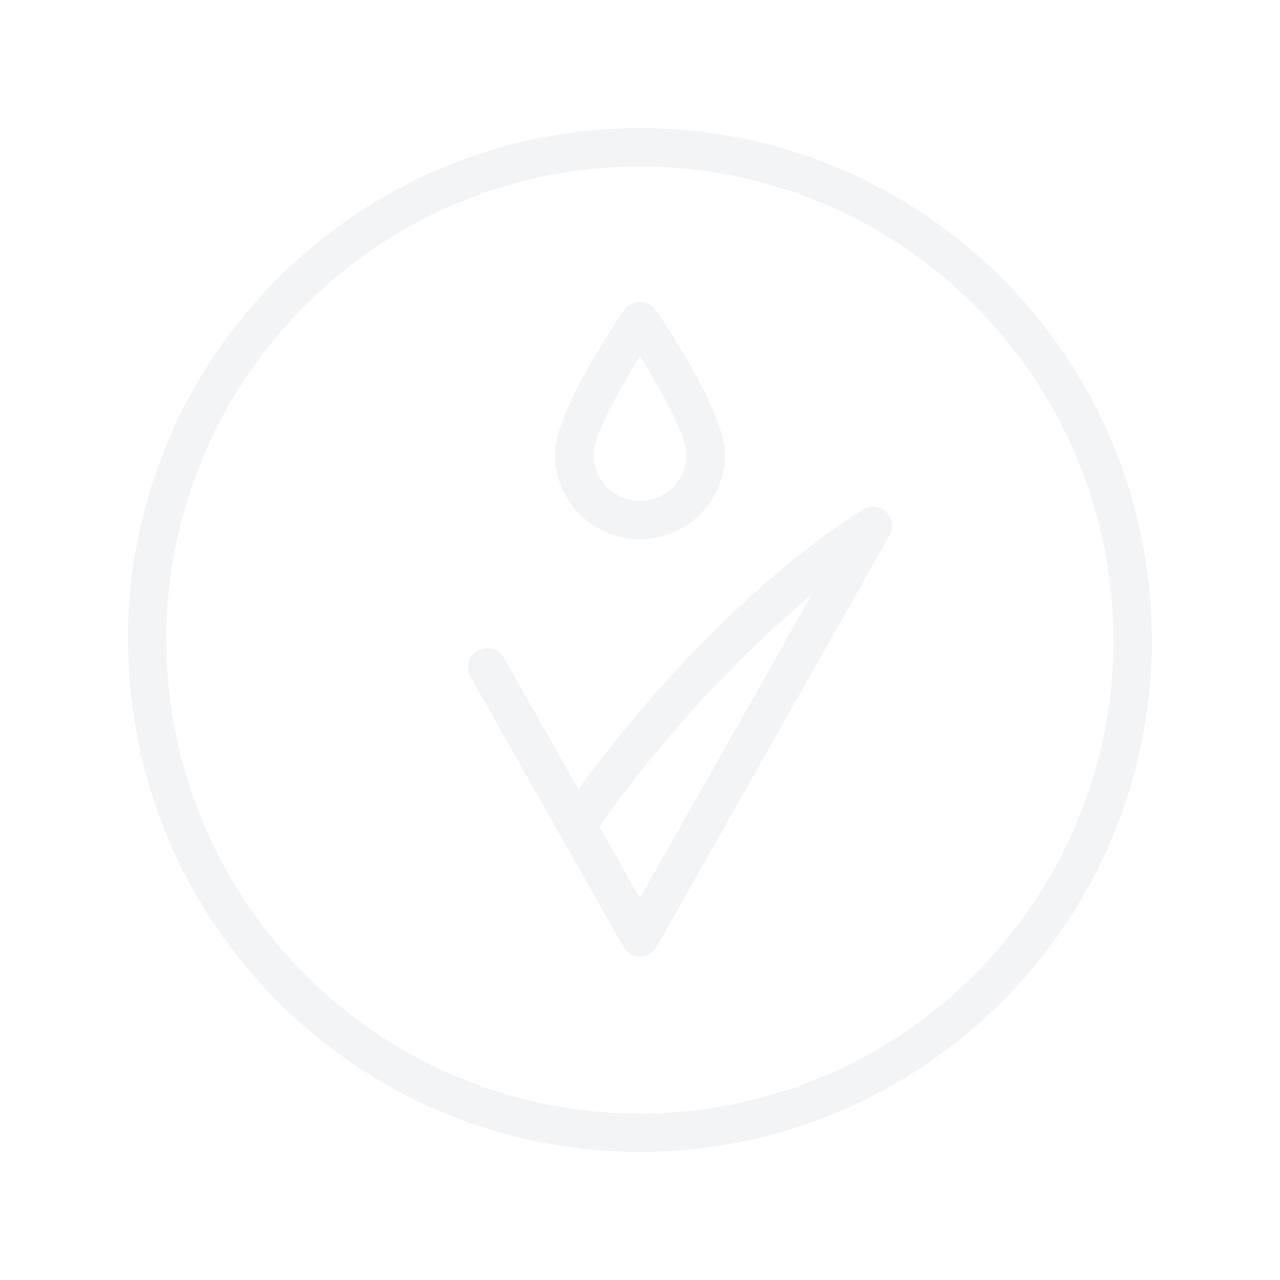 MINIGOLD Moonlight Dark Sonata E Earrings